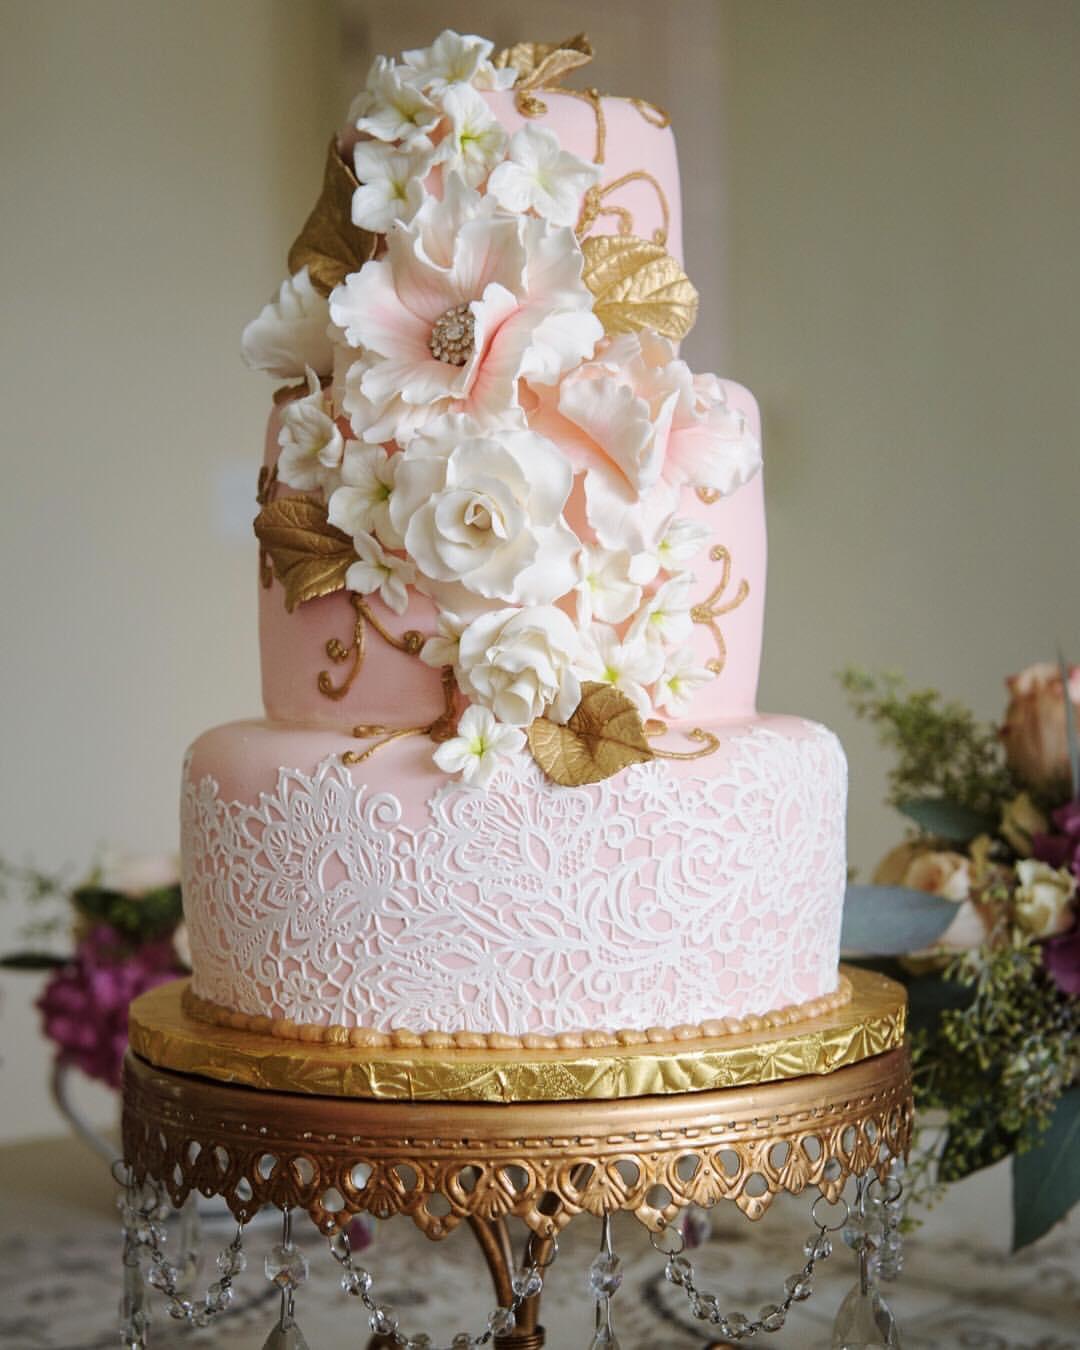 blush pink wedding cake by plumeria cake studio-gold chandelier cake stand by opulernt treasures.jpg